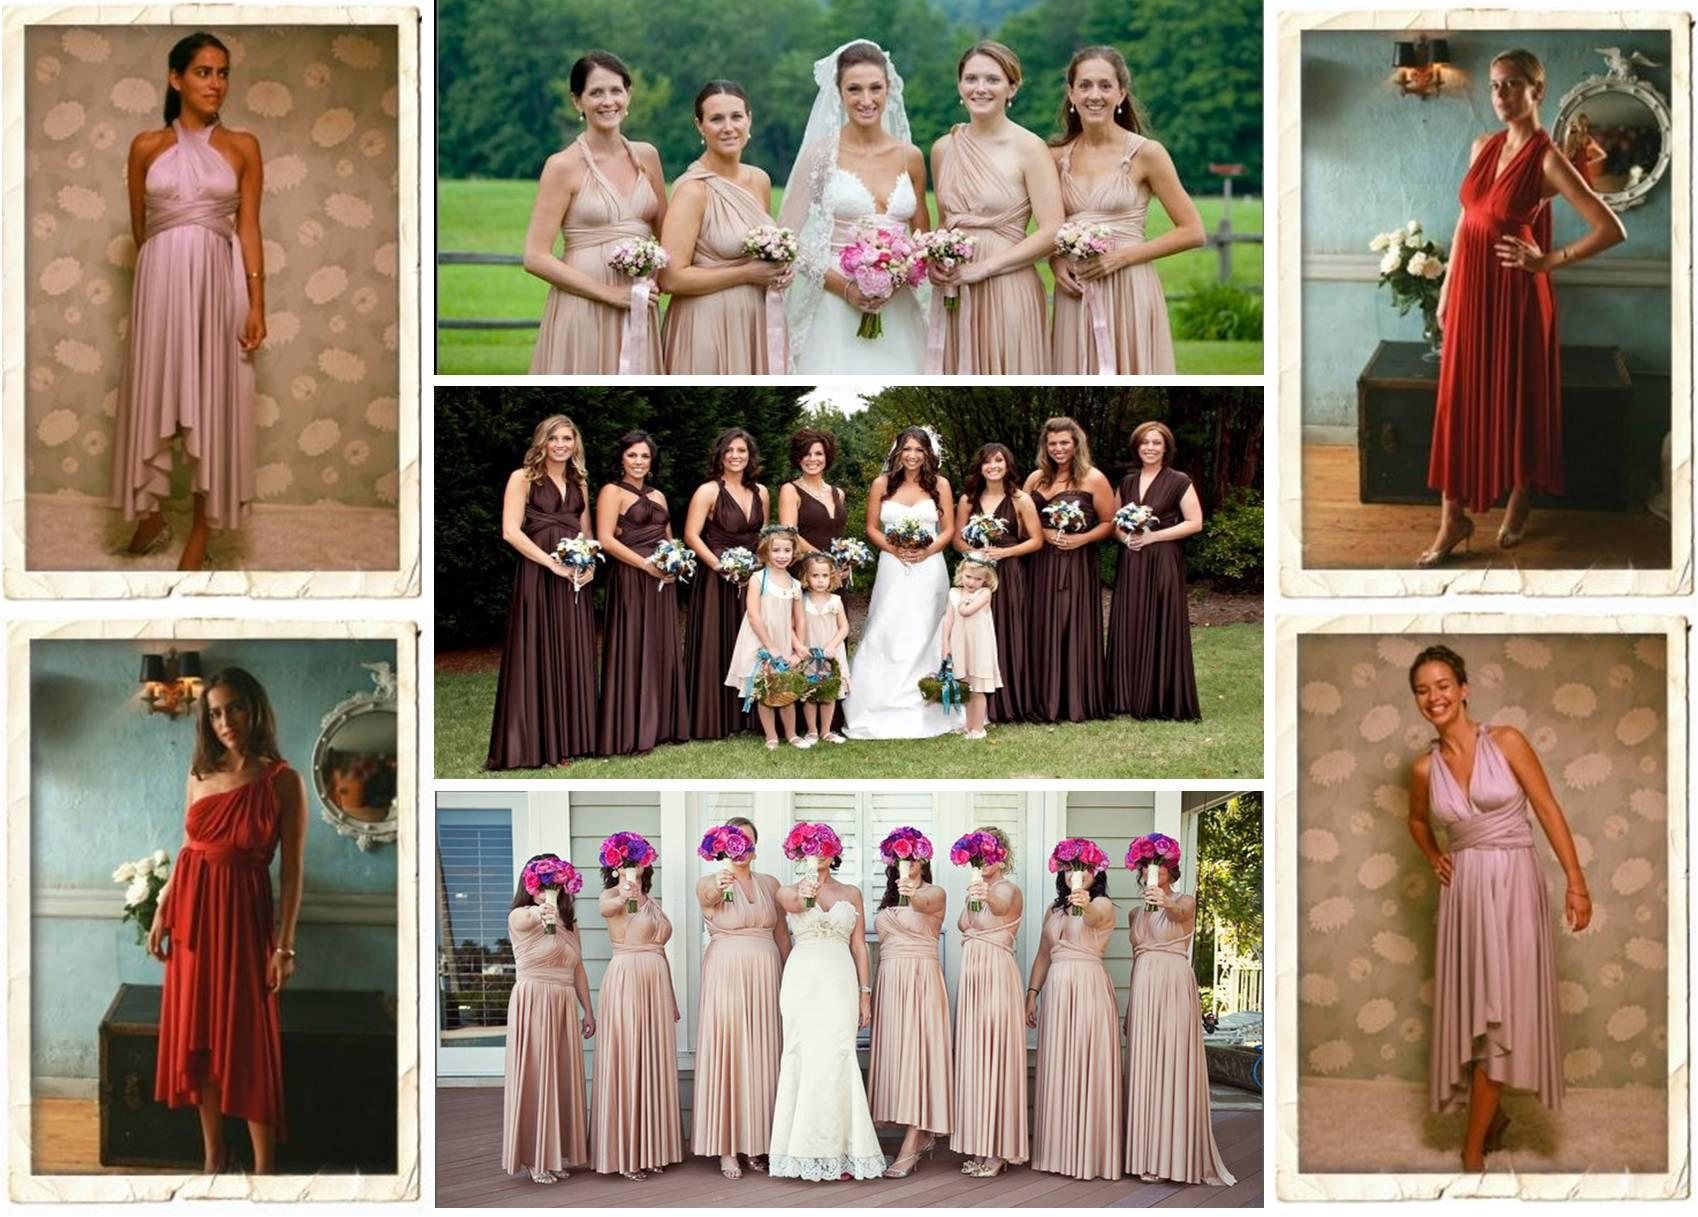 2 birds bridesmaid dresses cocktail dresses 2016 2 birds bridesmaid dresses ombrellifo Image collections